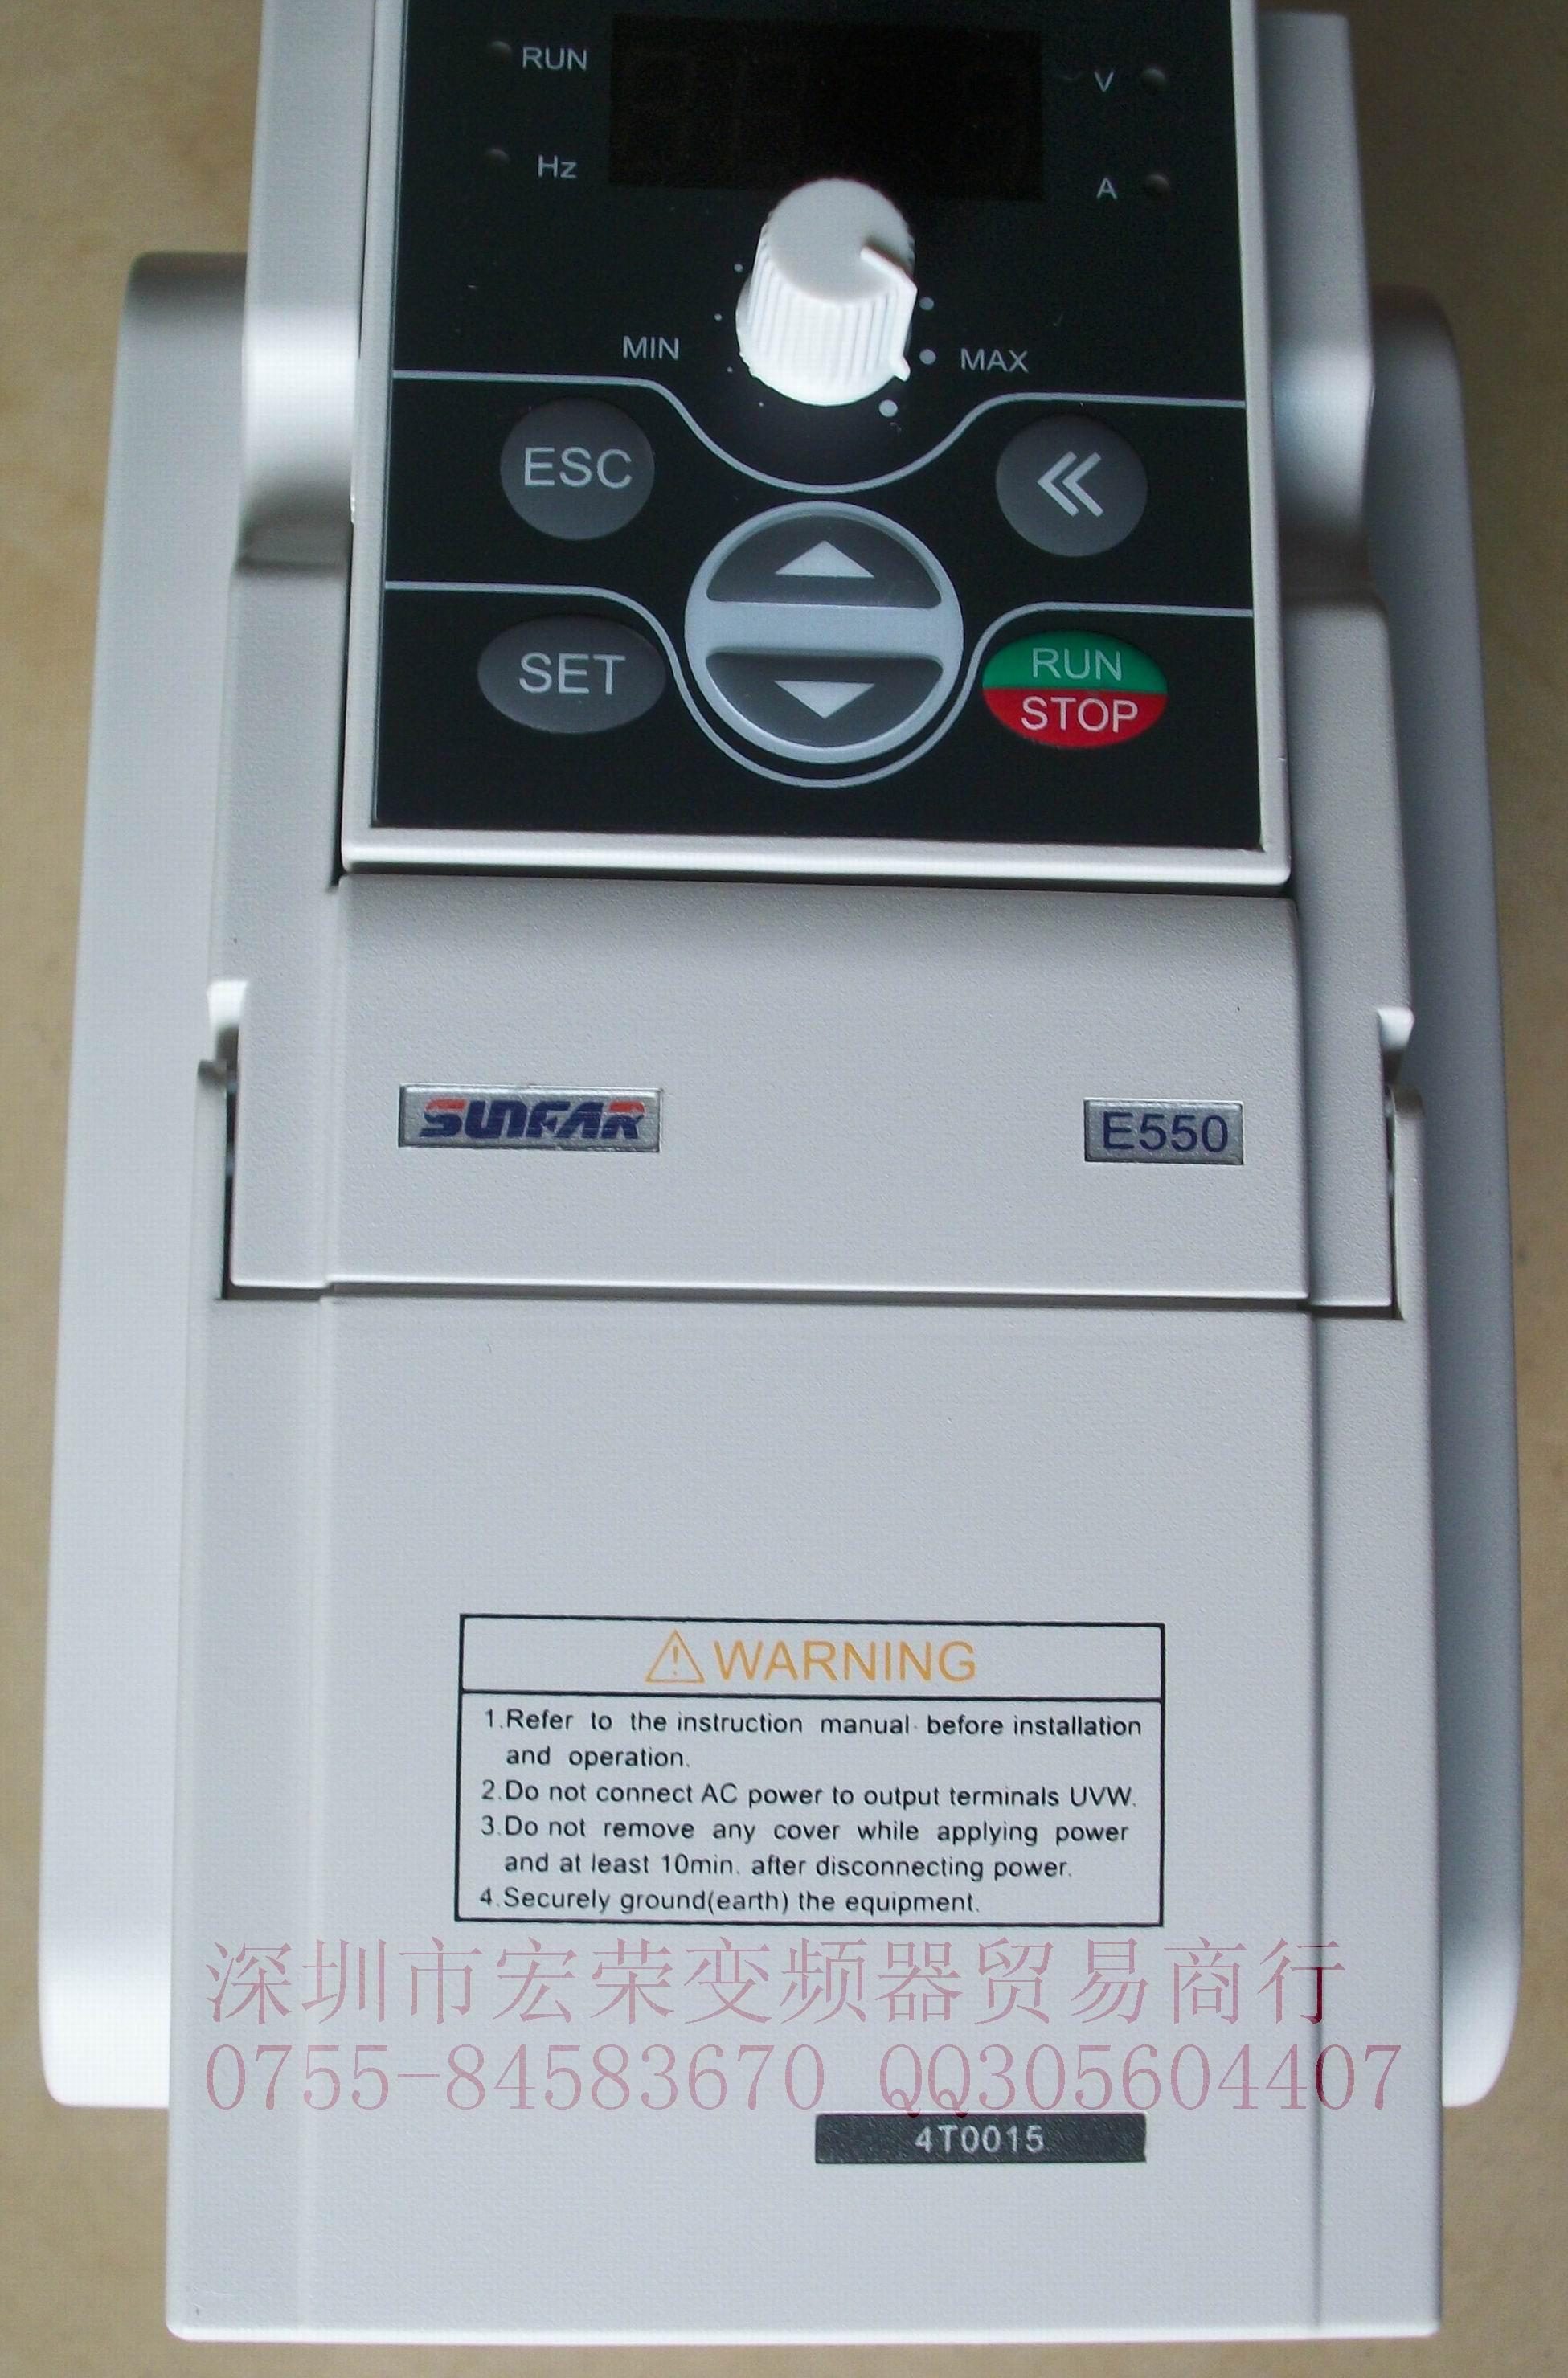 SUNFAR变频调速器E550-4T0015及显示面板现货